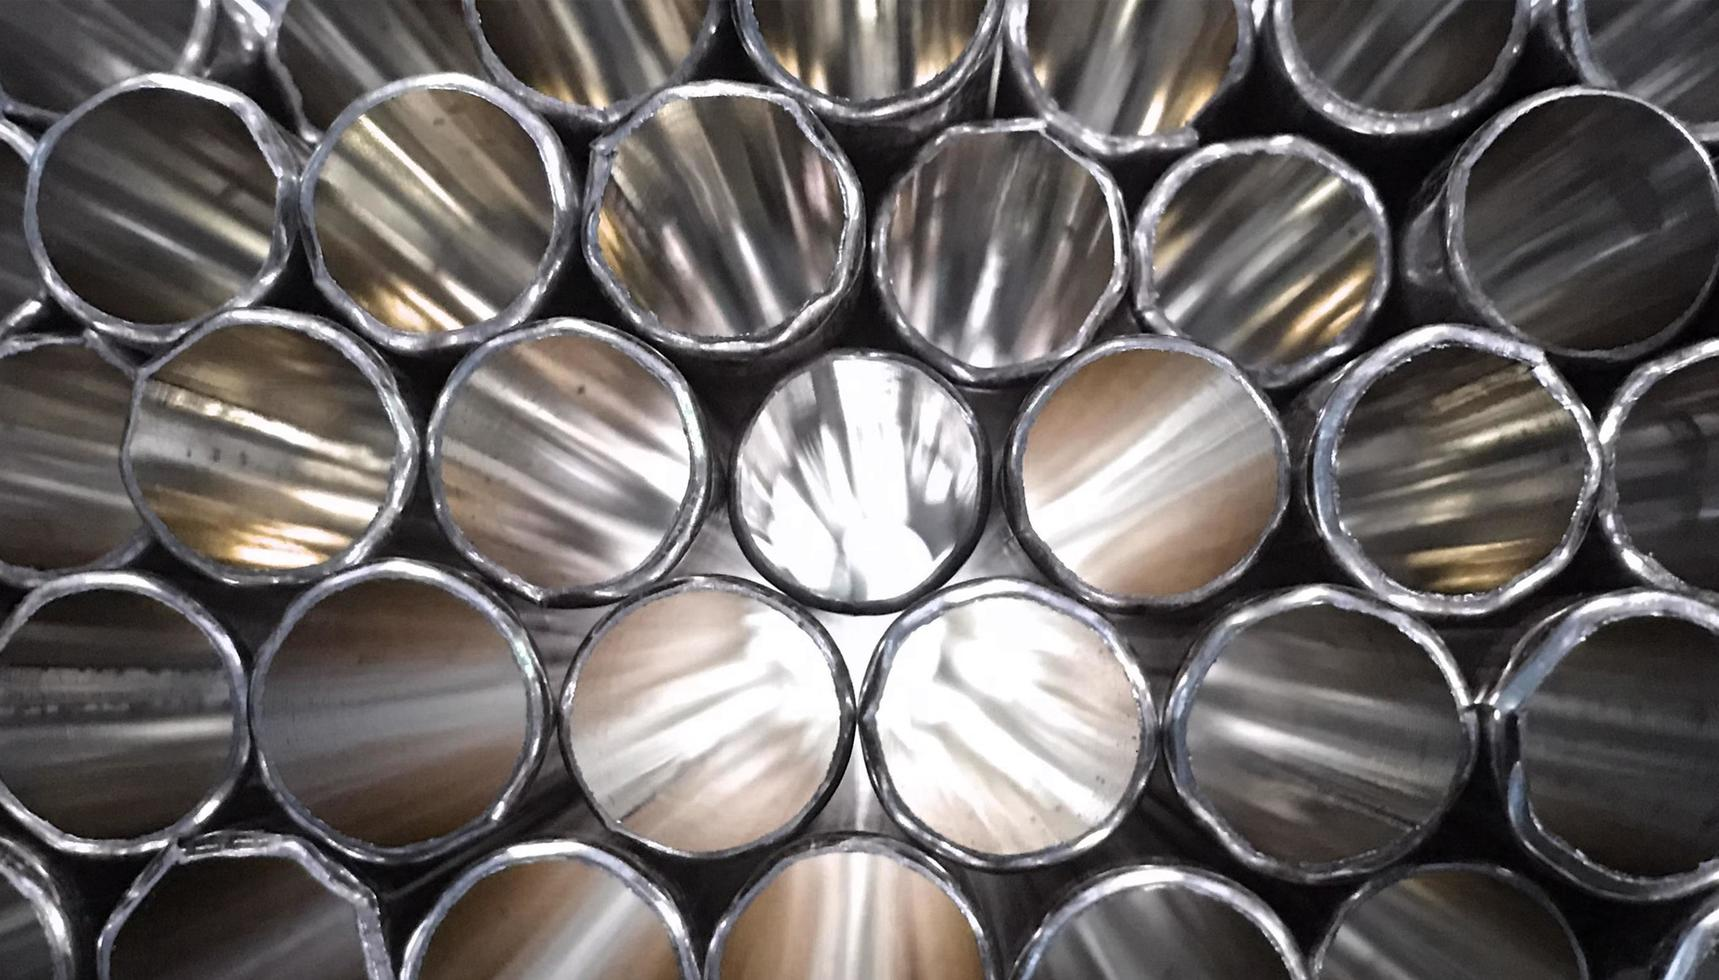 tubi in metallo argentato foto